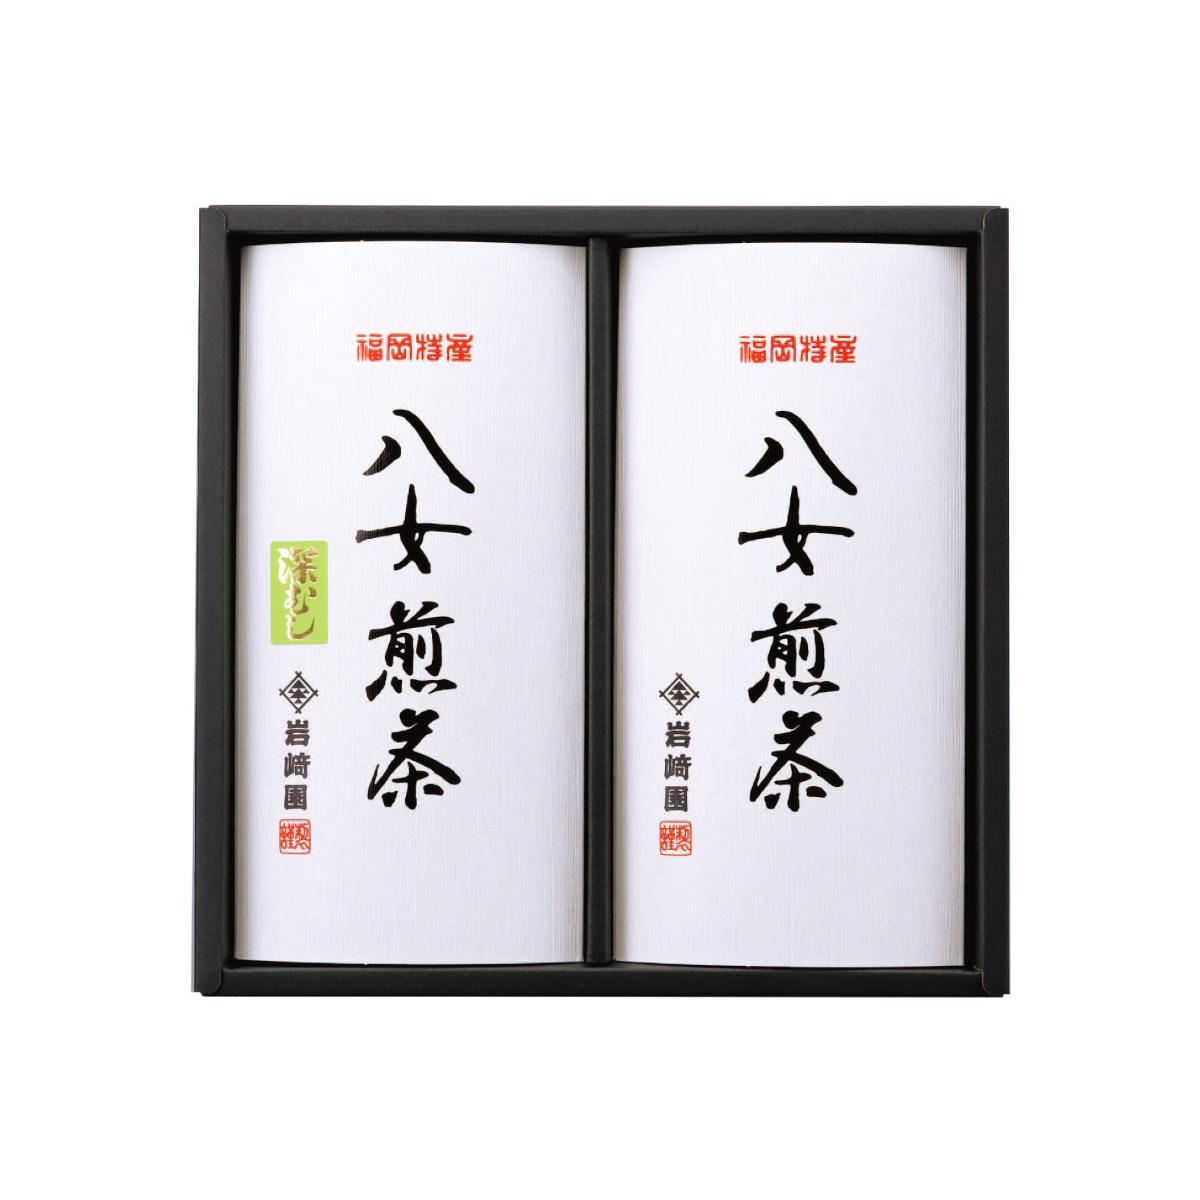 【G-296・ニフ】≪仏事用≫特上煎茶・深むし茶 80g×2本ギフト